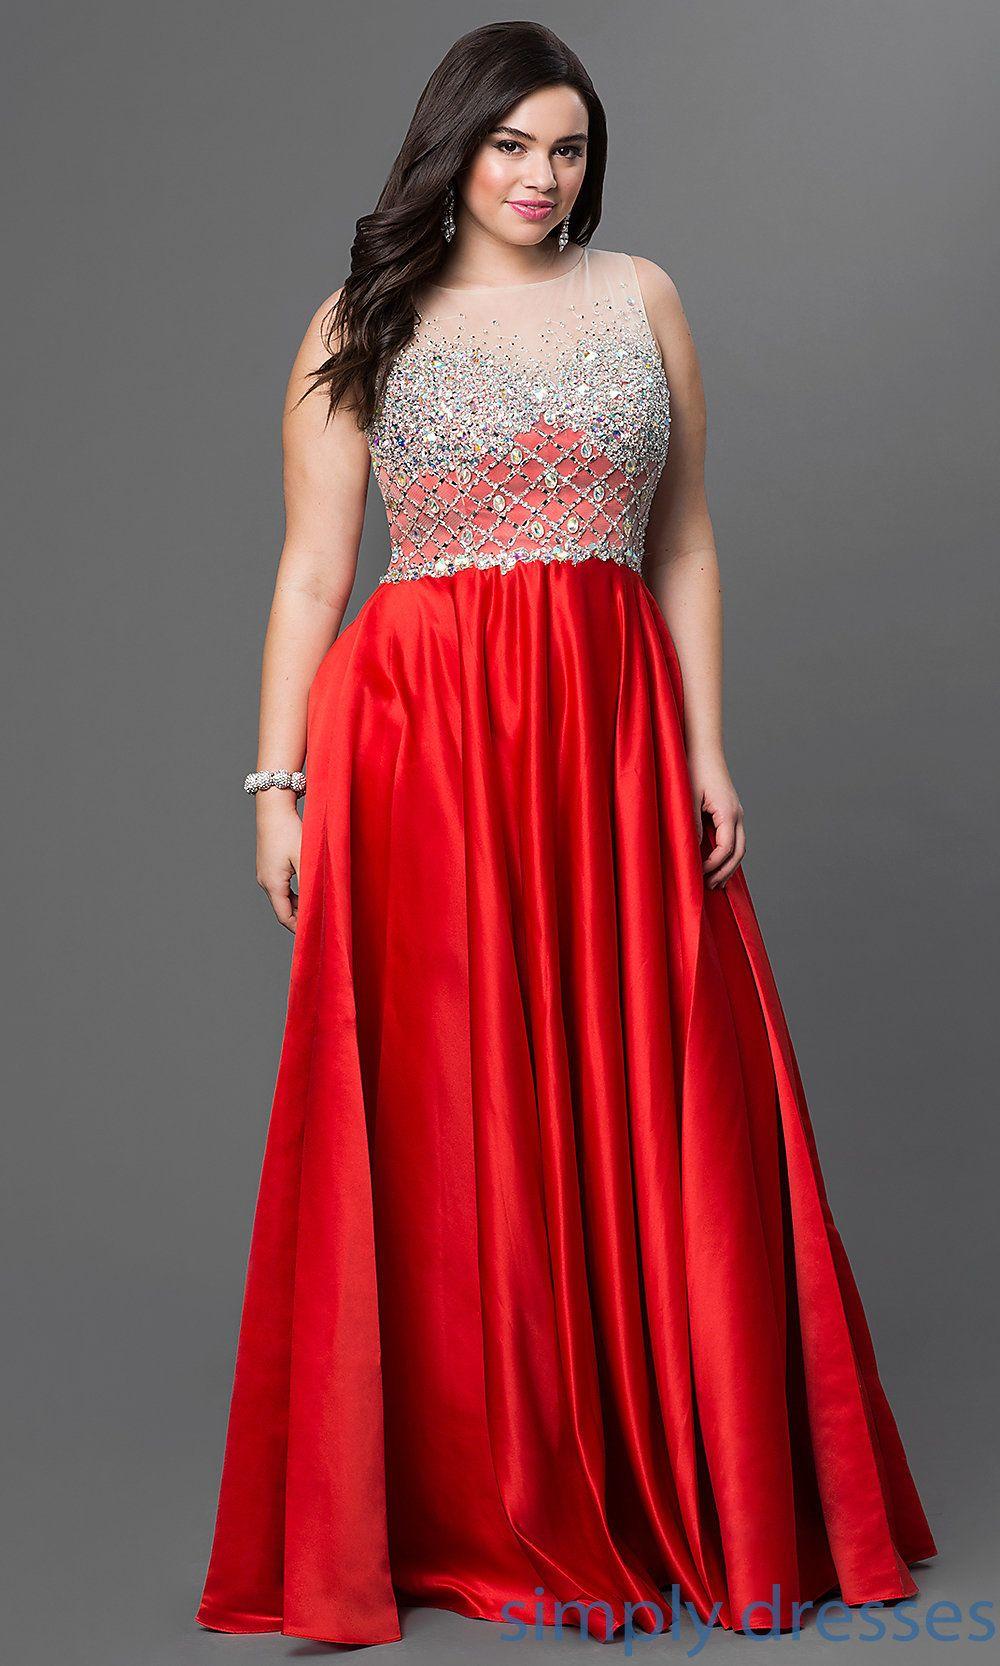 Dresses Formal Prom Dresses Evening Wear Na 8175p Plus Size Prom Dresses Custom Made Prom Dress Evening Dresses Plus Size [ 1666 x 1000 Pixel ]